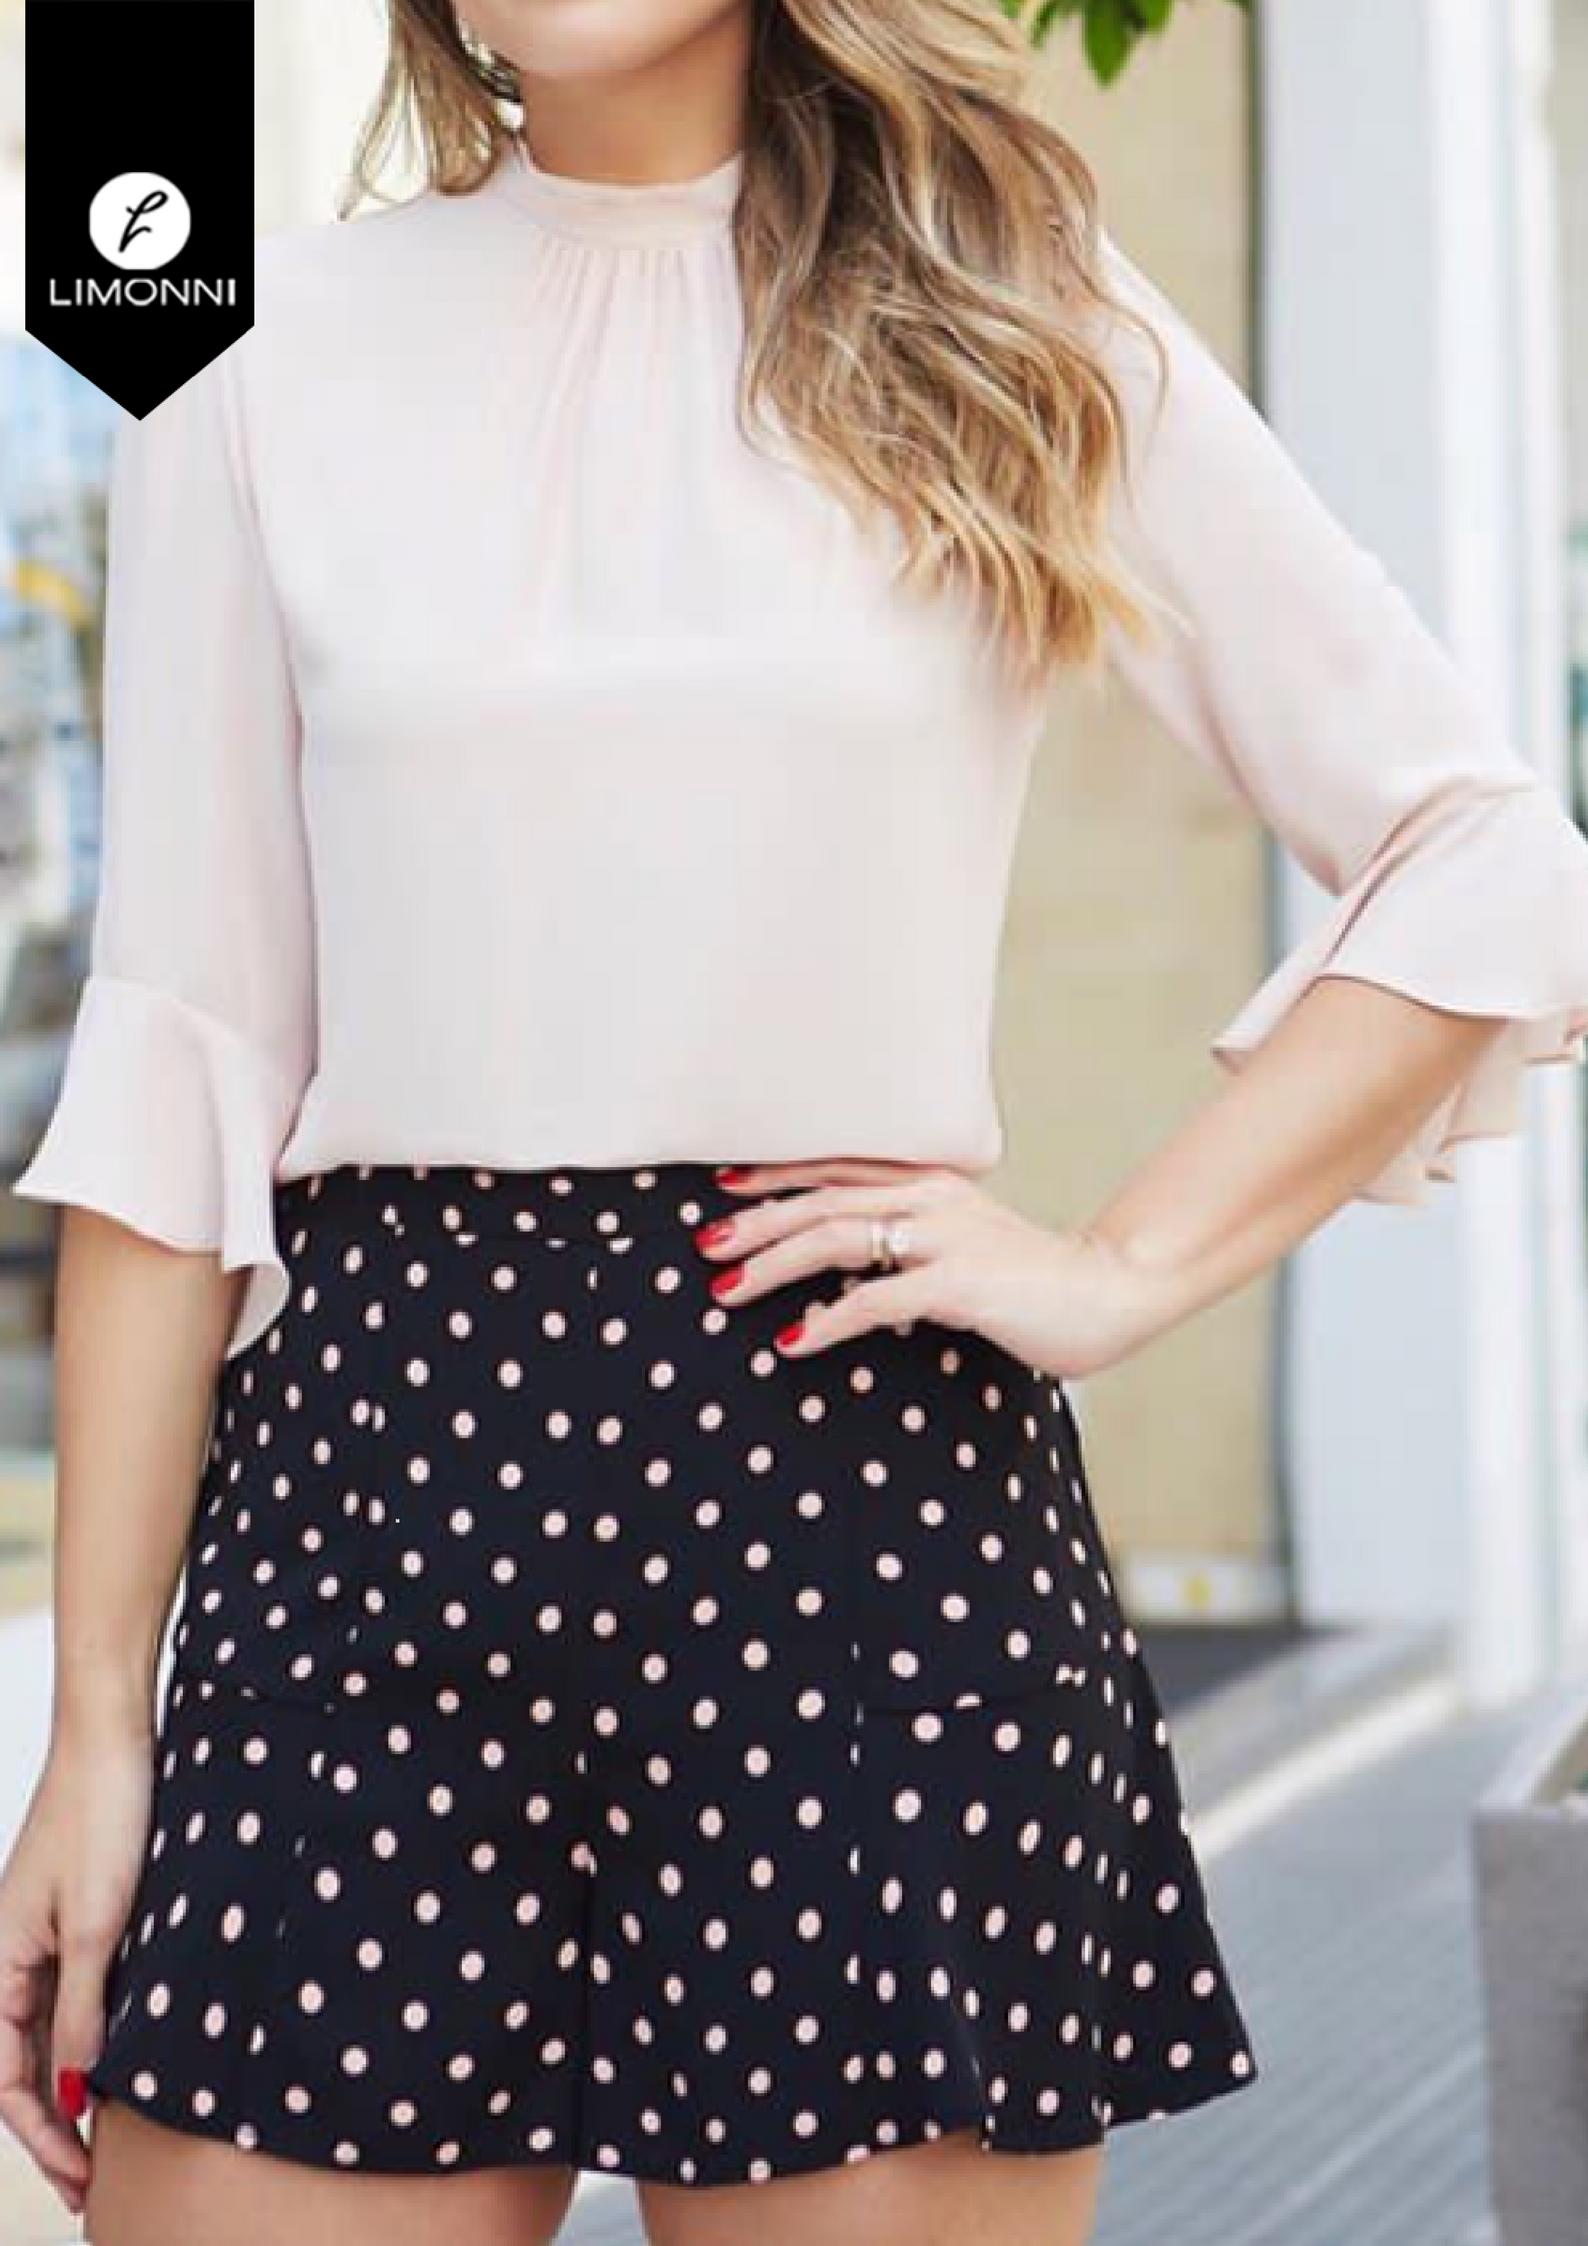 Blusas para mujer Limonni Bennett LI1401 Campesinas